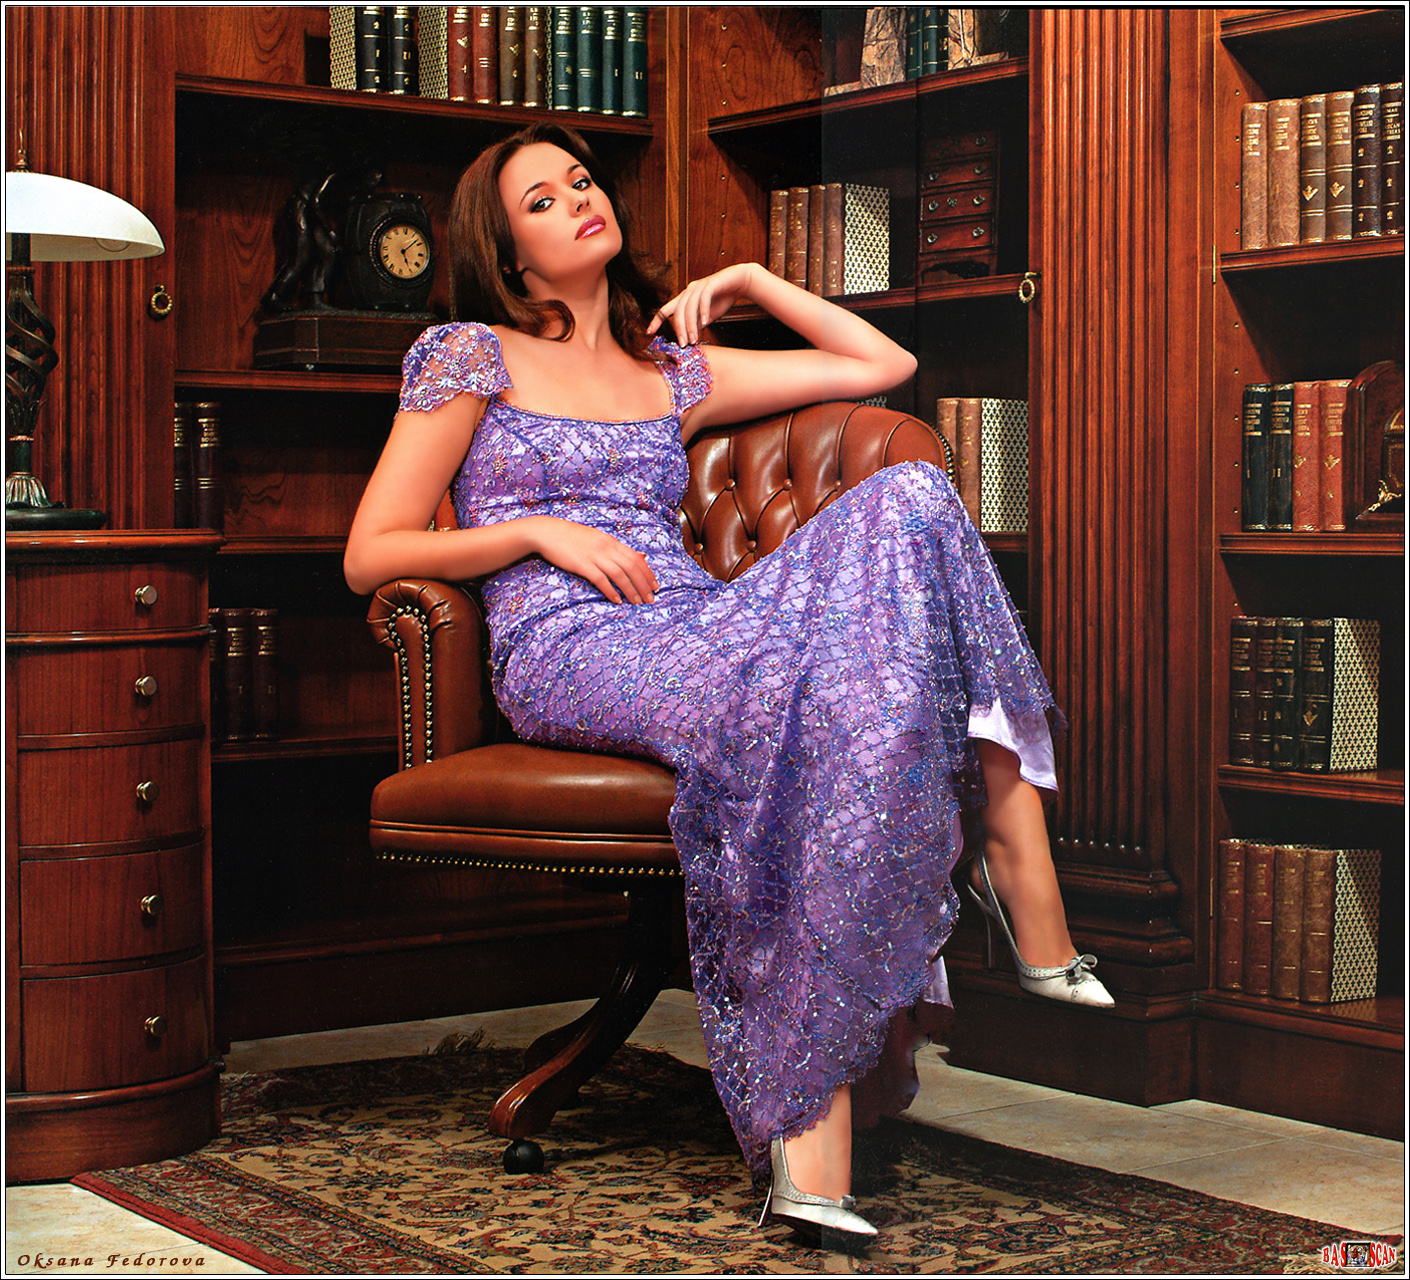 oxana fedorova, miss universe 2002 (renuncio). - Página 3 Mq6nais6